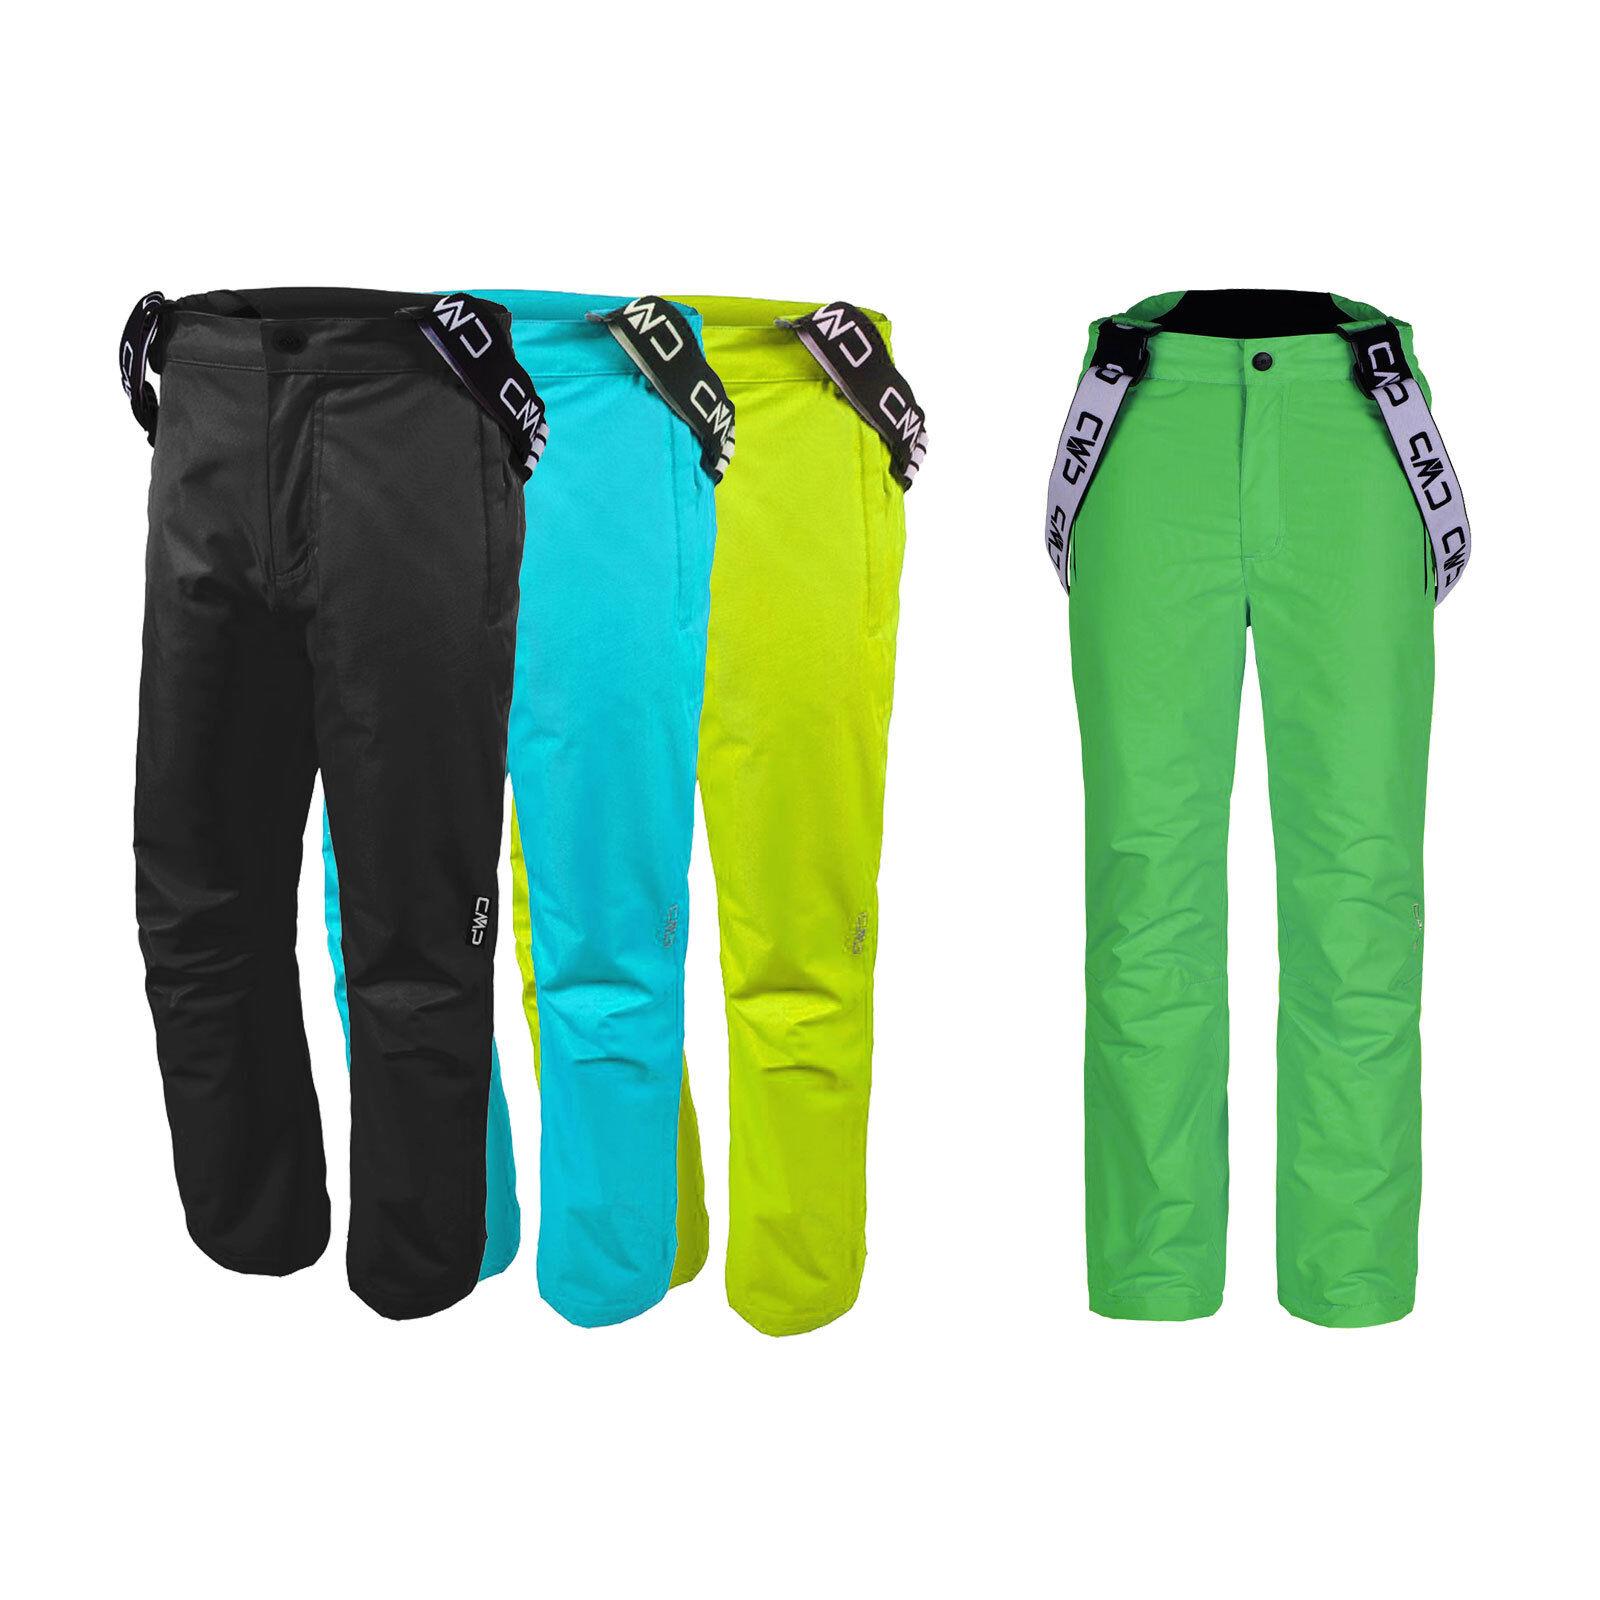 Campagnolo CMP Ski Salopette Kinder-Skihose Schneehose Snowboardhose Latzhose Schneehose Kinder-Skihose 1f83b3